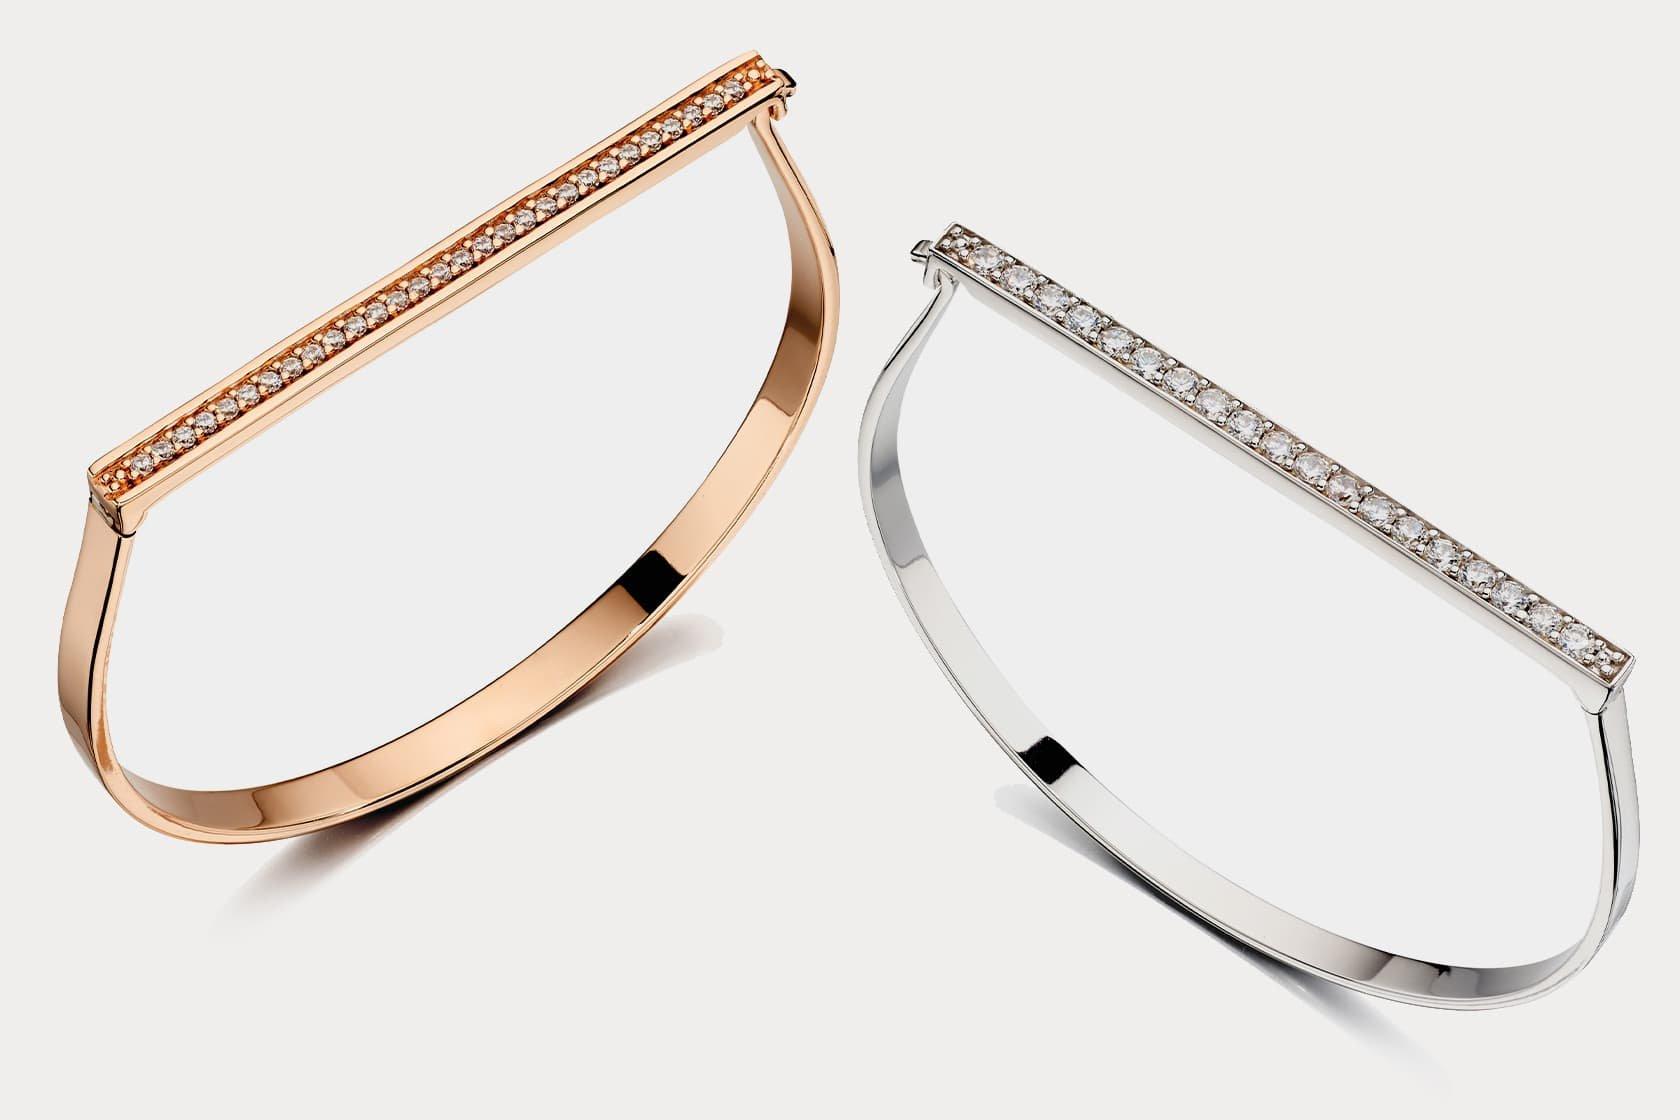 Women's Jewellery Under £250